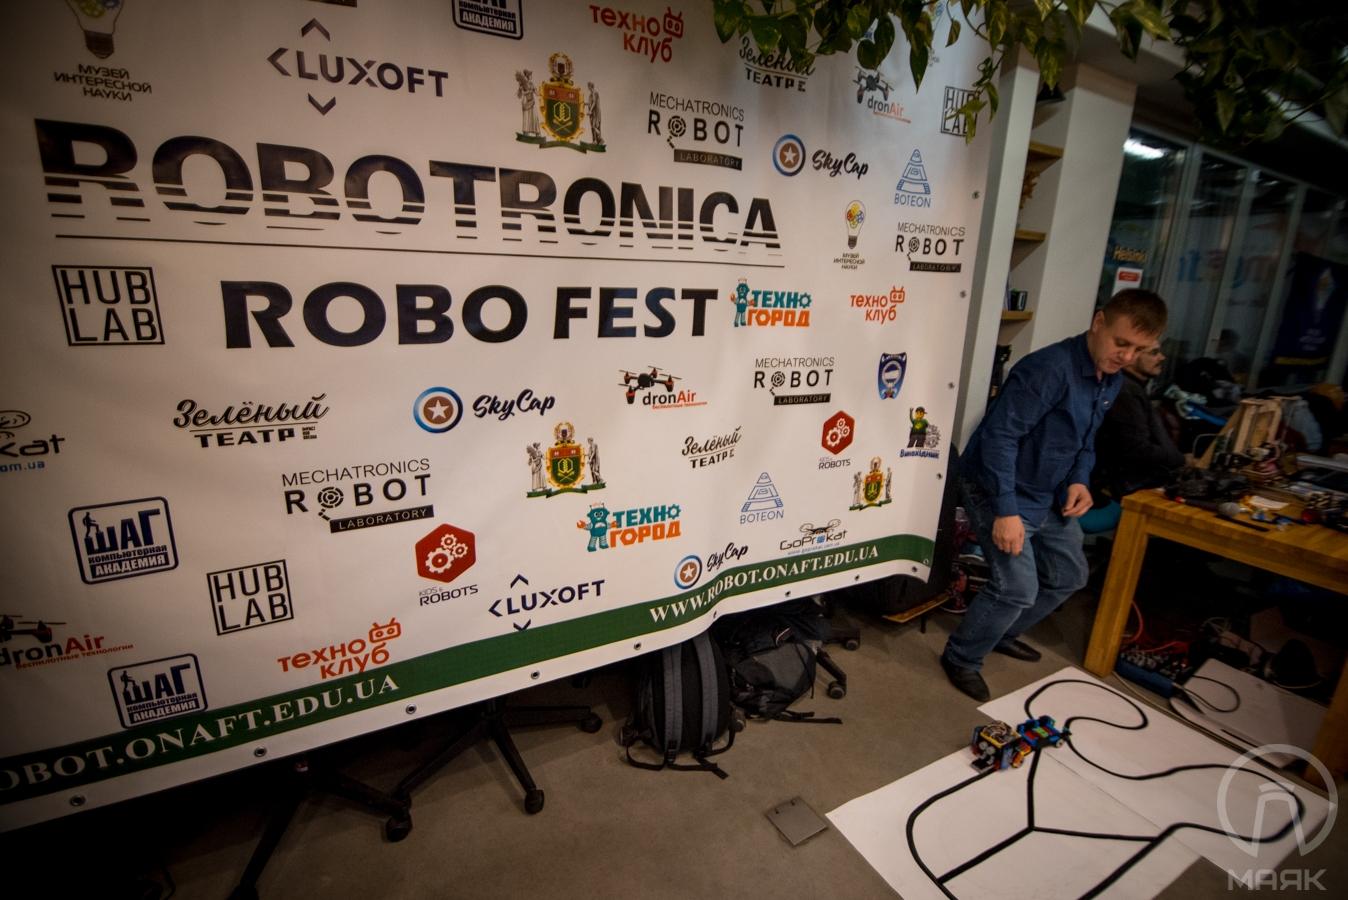 robotronica-hub-8